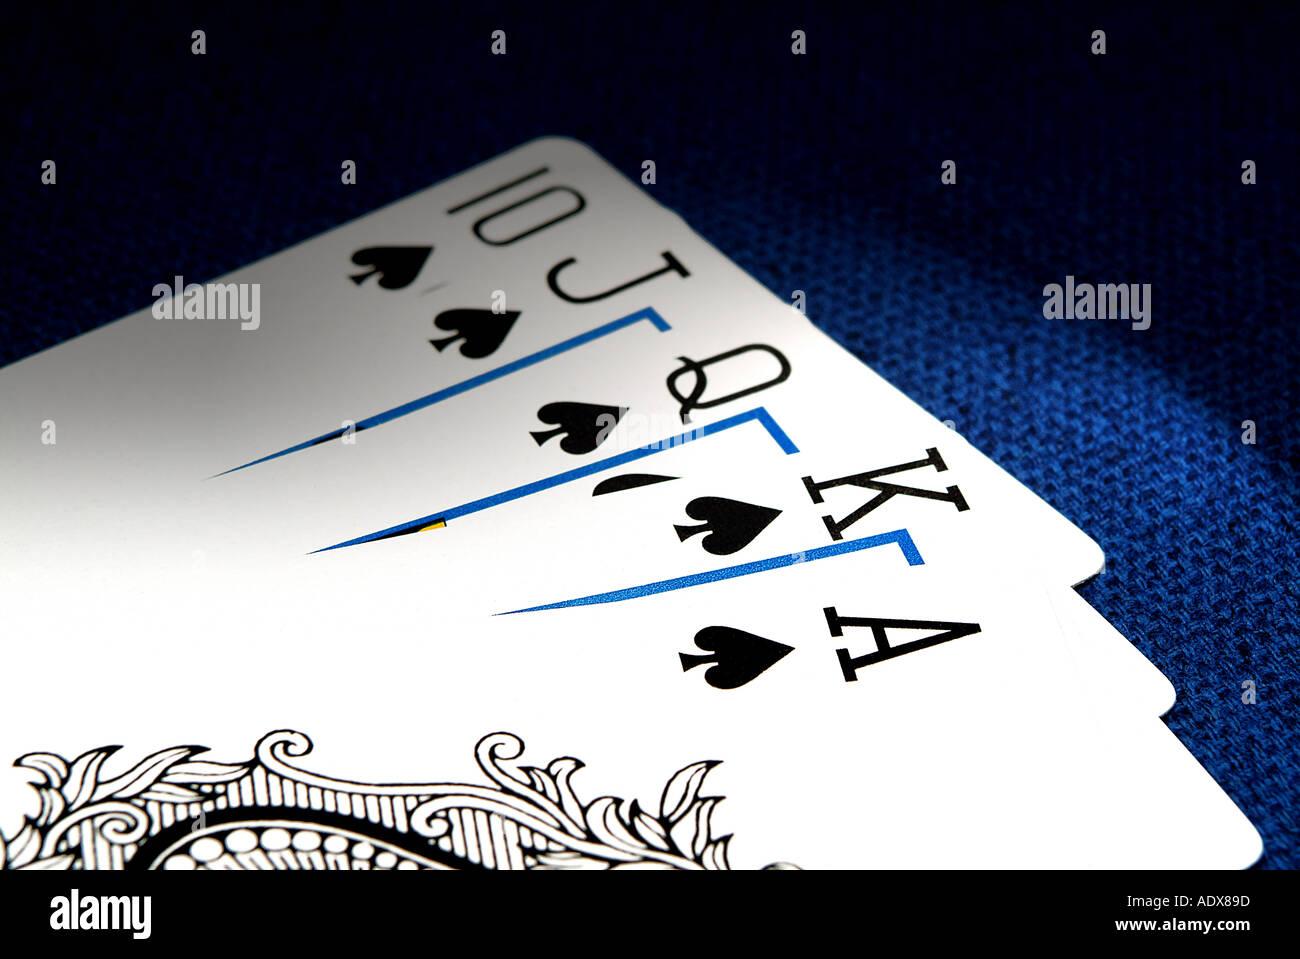 Business concepts ii deck set playing cards card gambling ace spades business concepts ii deck set playing cards card gambling ace spades poker bridge games blue felt royal street flush winning colourmoves